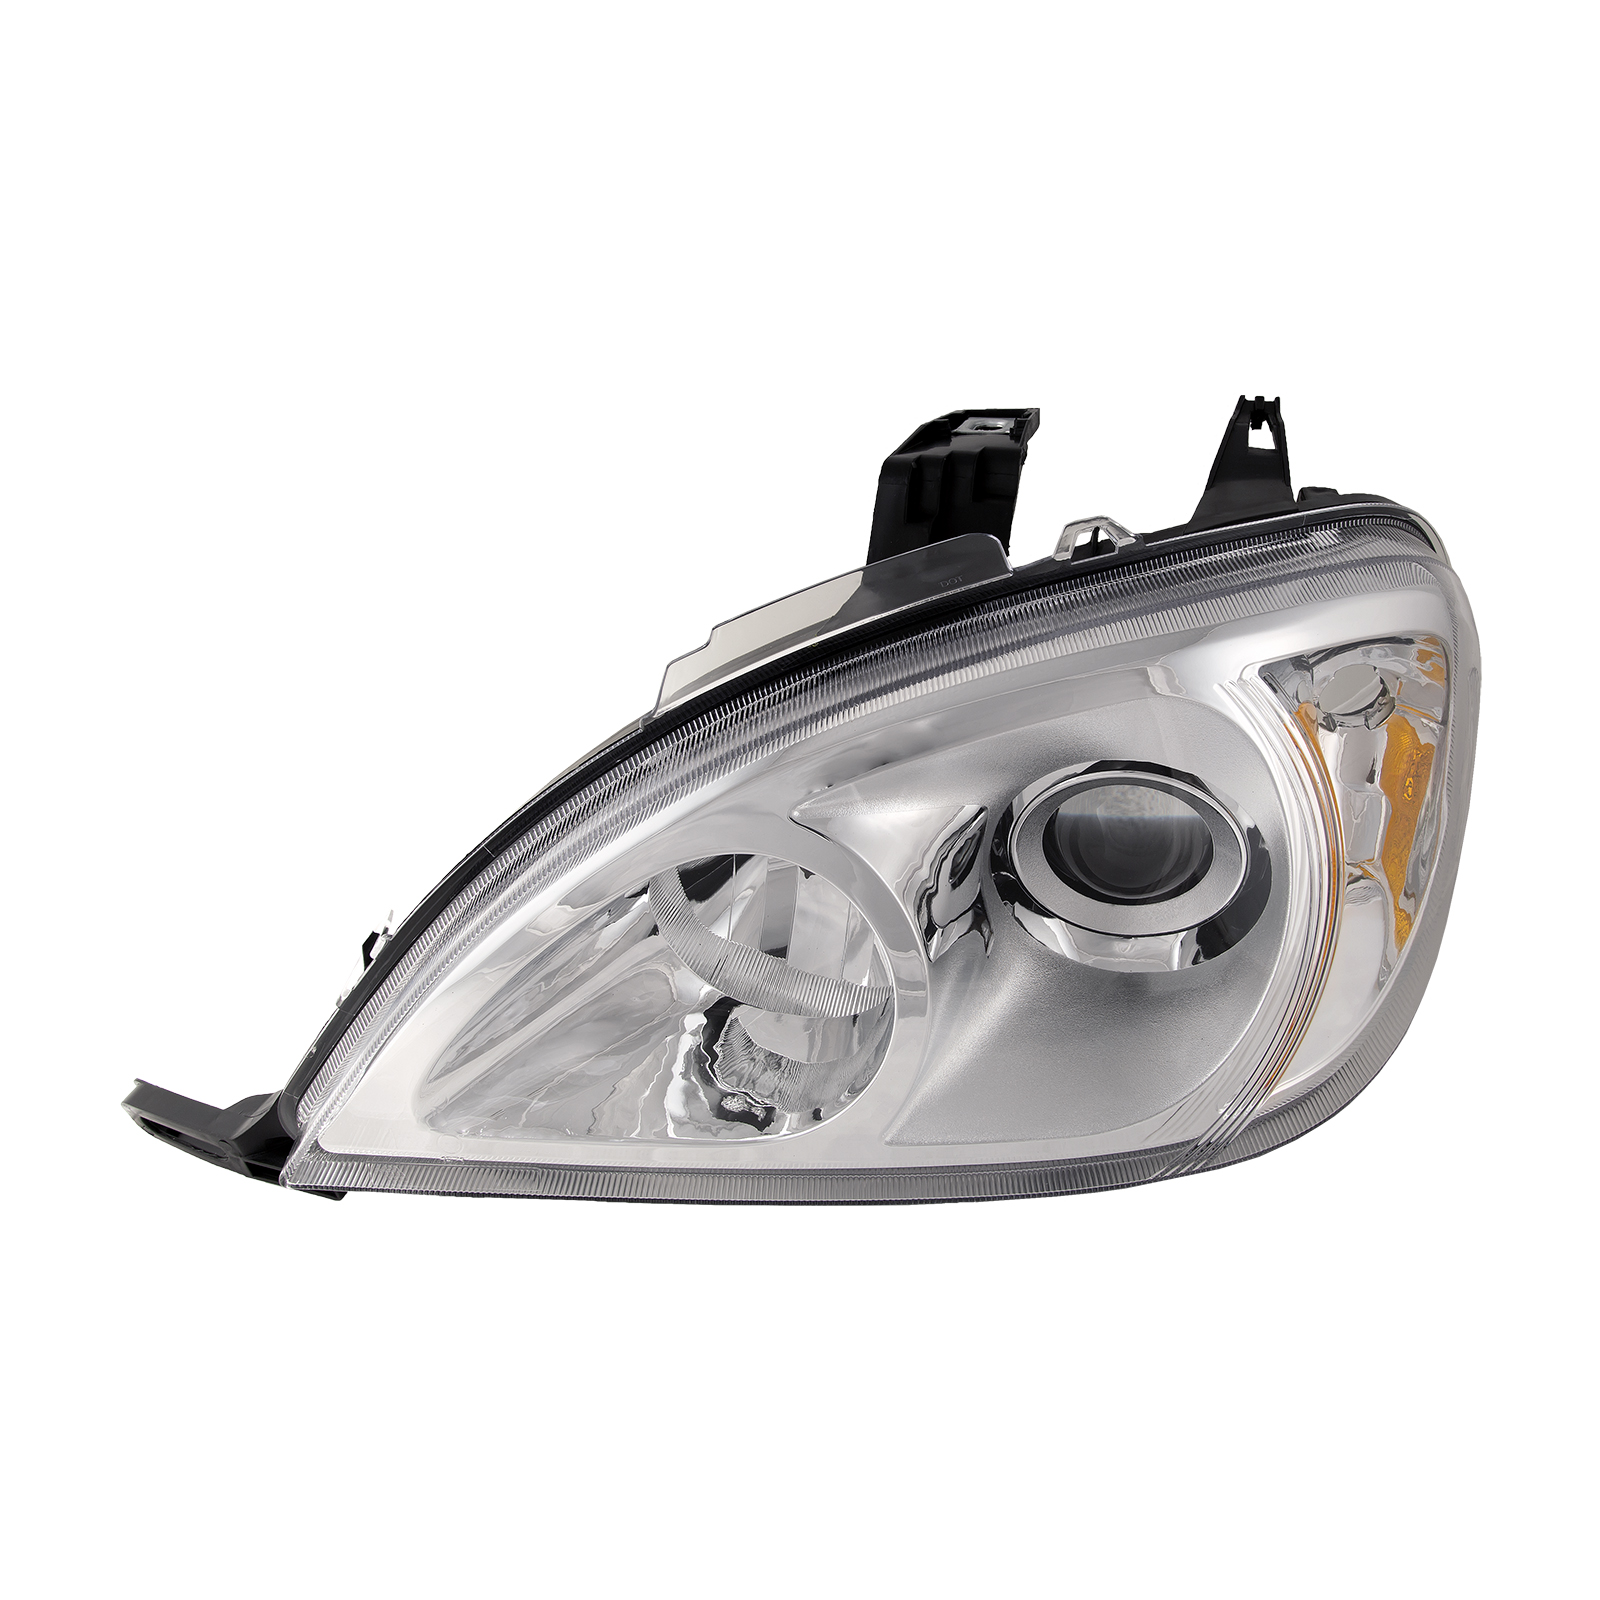 TIFFIN PHAETON 2004 04 PAIR HEADLIGHTS HEAD LIGHT FRONT LAMPS SET RV LEFT RIGHT